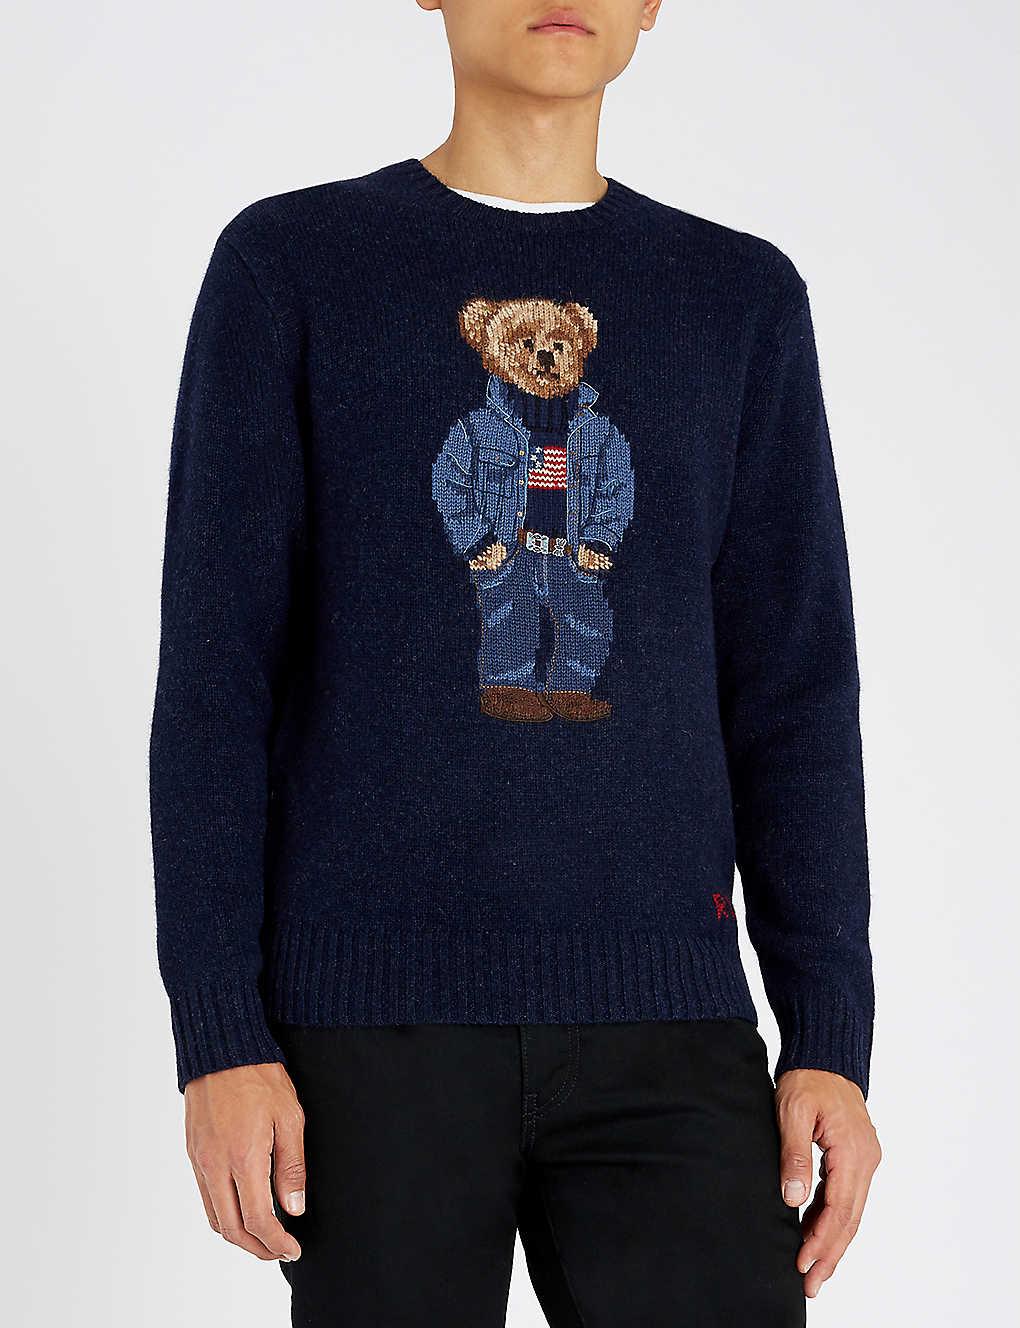 a3e37d59c34ed POLO RALPH LAUREN - Teddy Bear intarsia-knit wool jumper ...